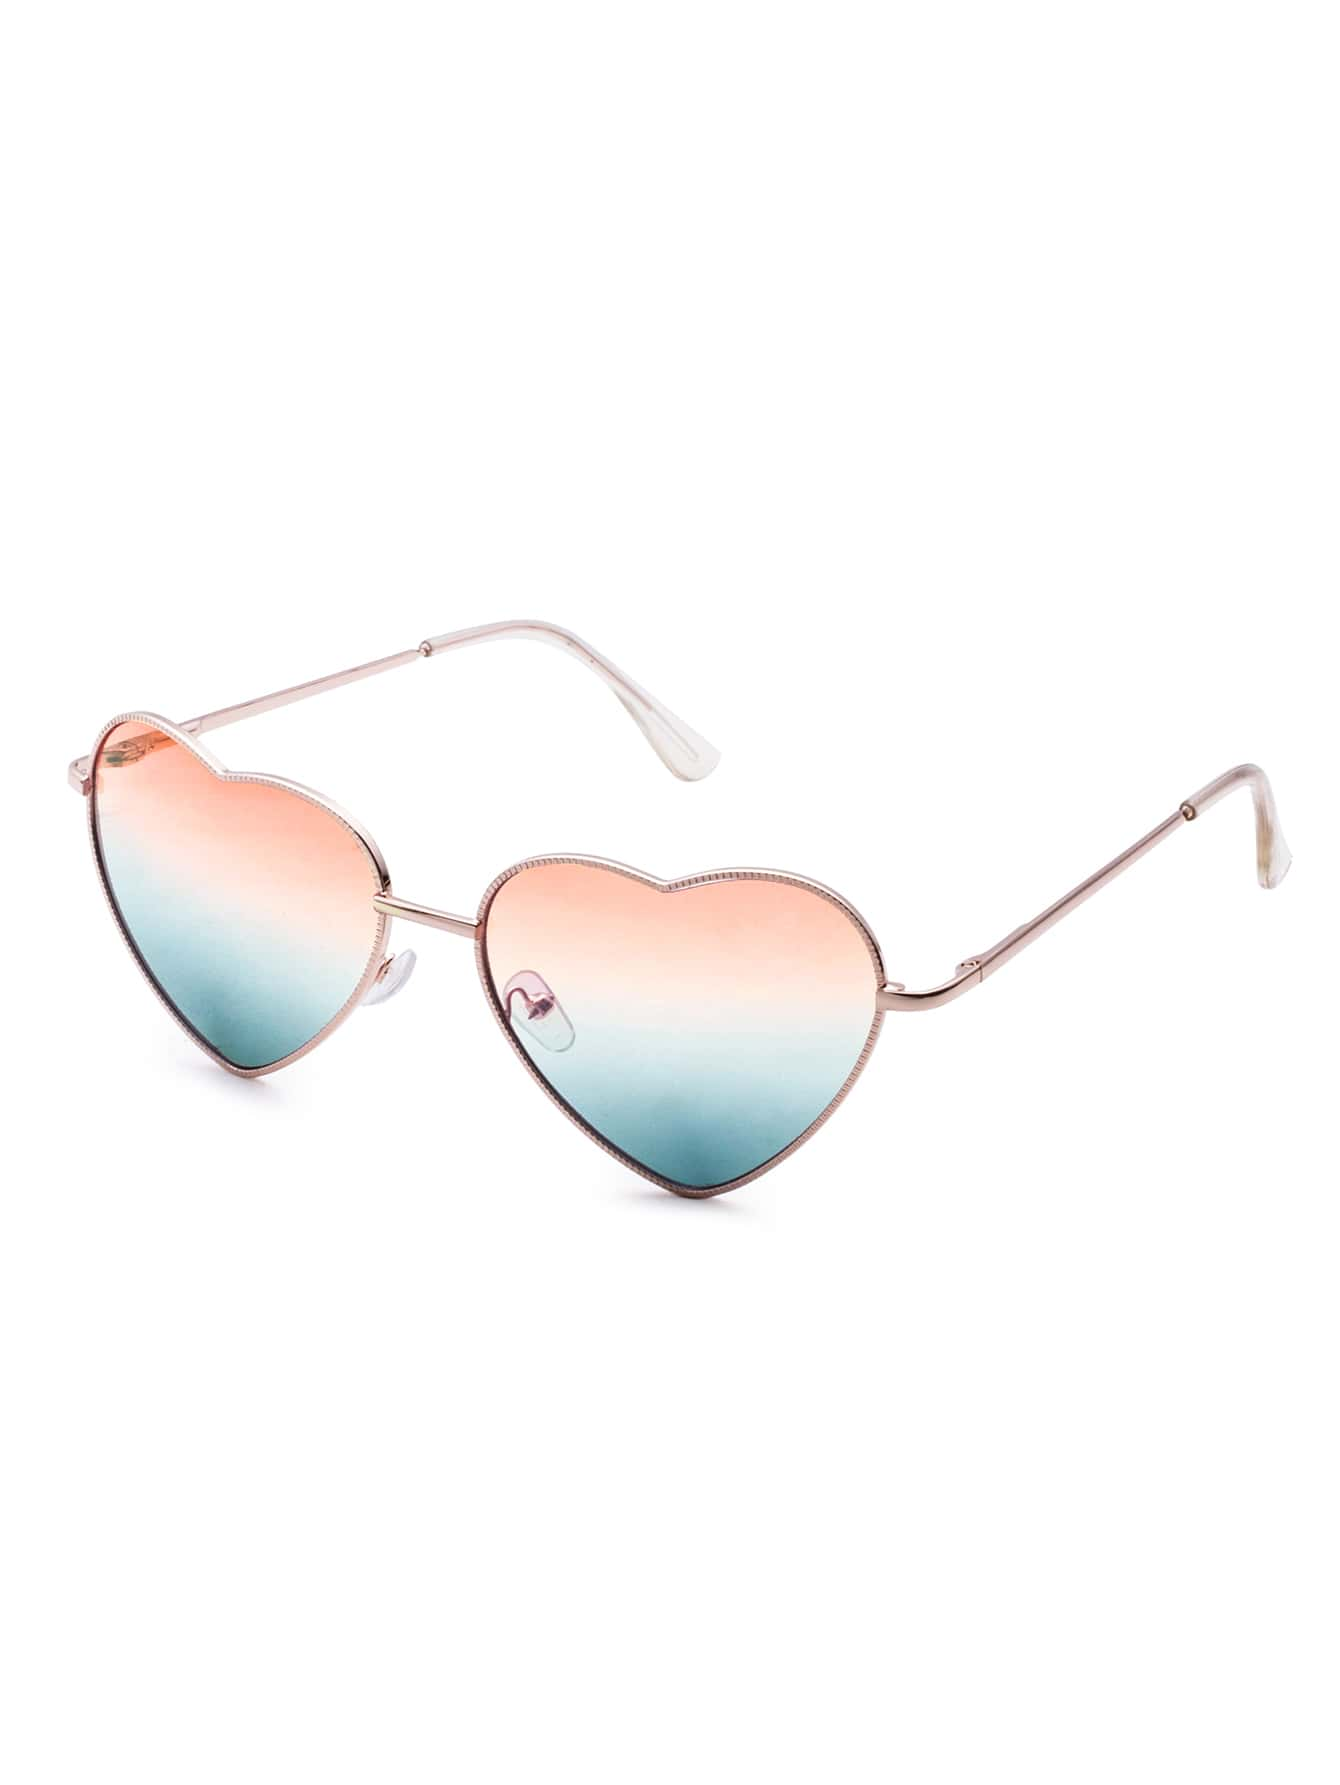 Gold Frame Heart Shaped Sunglasses : Rose Gold Plated Frame Heart Shape Casual Sunglasses